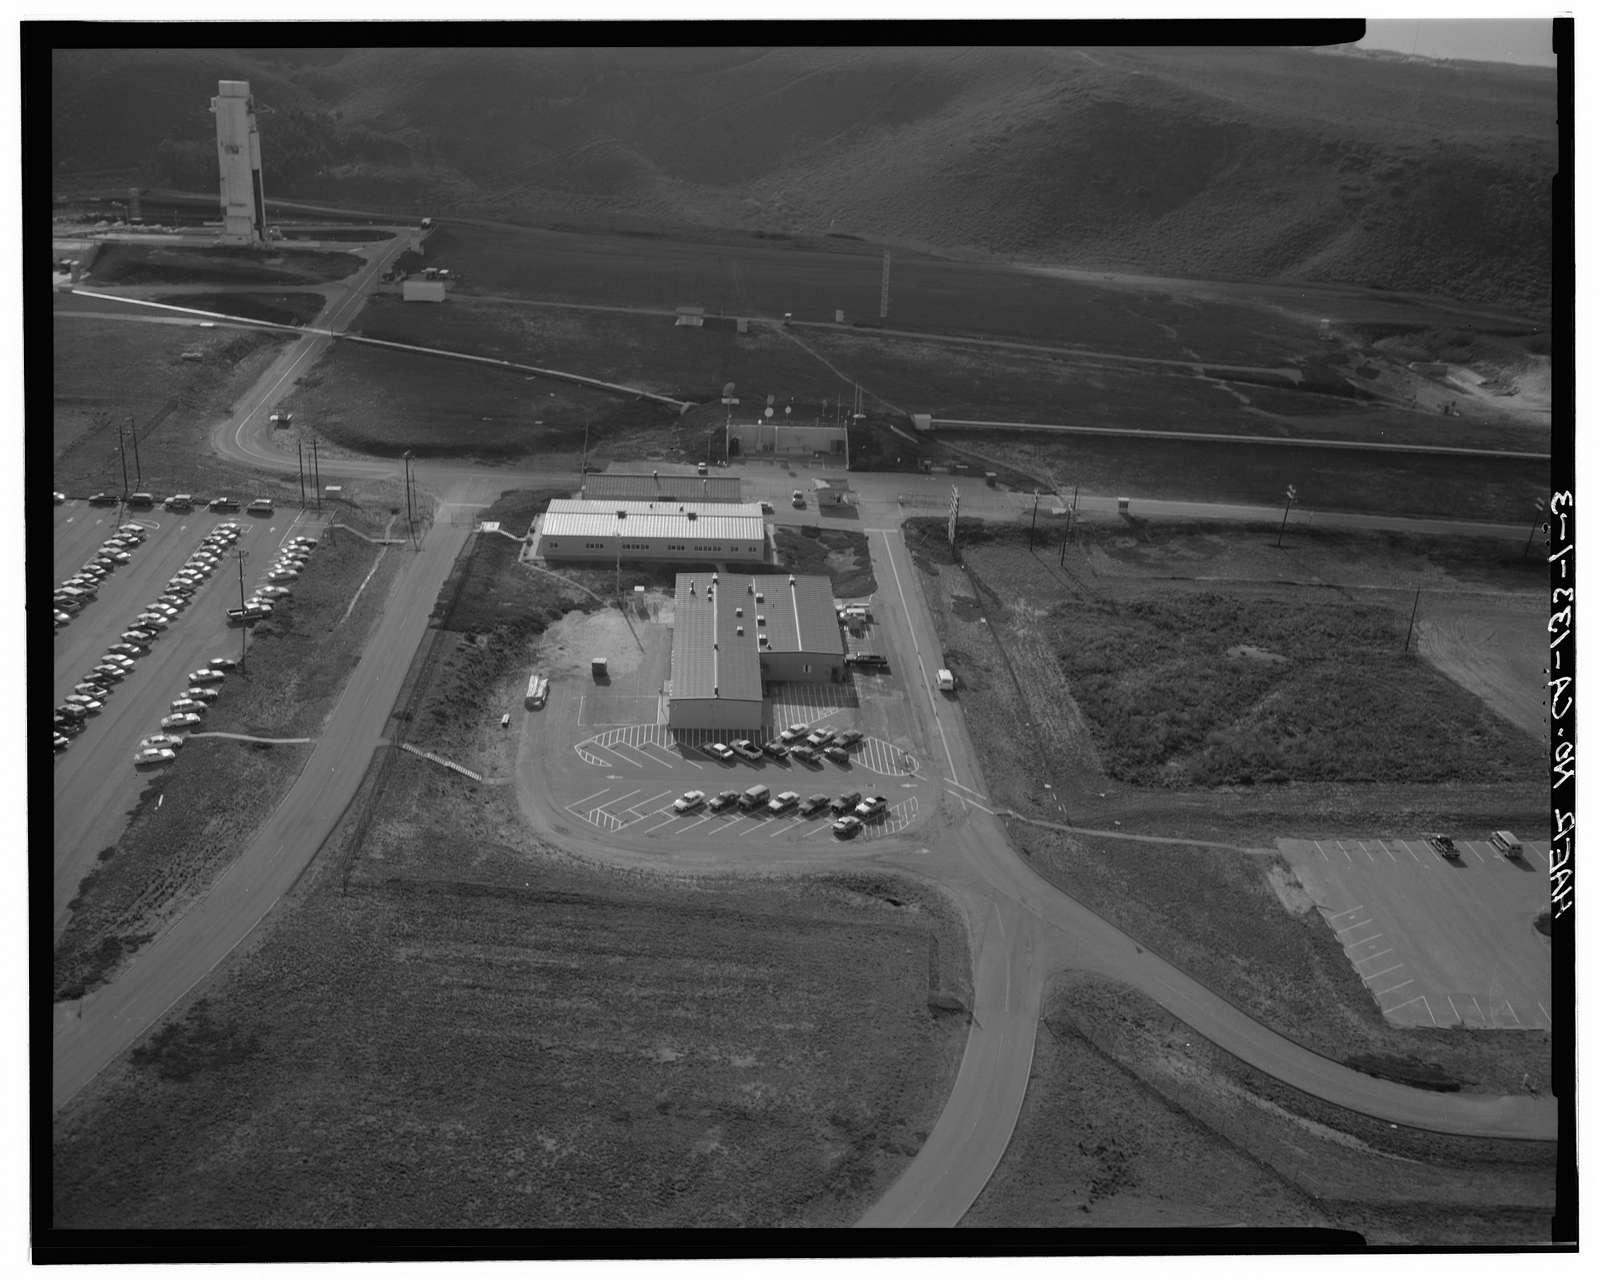 Vandenberg Air Force Base, Space Launch Complex 3, Napa & Alden Roads, Lompoc, Santa Barbara County, CA